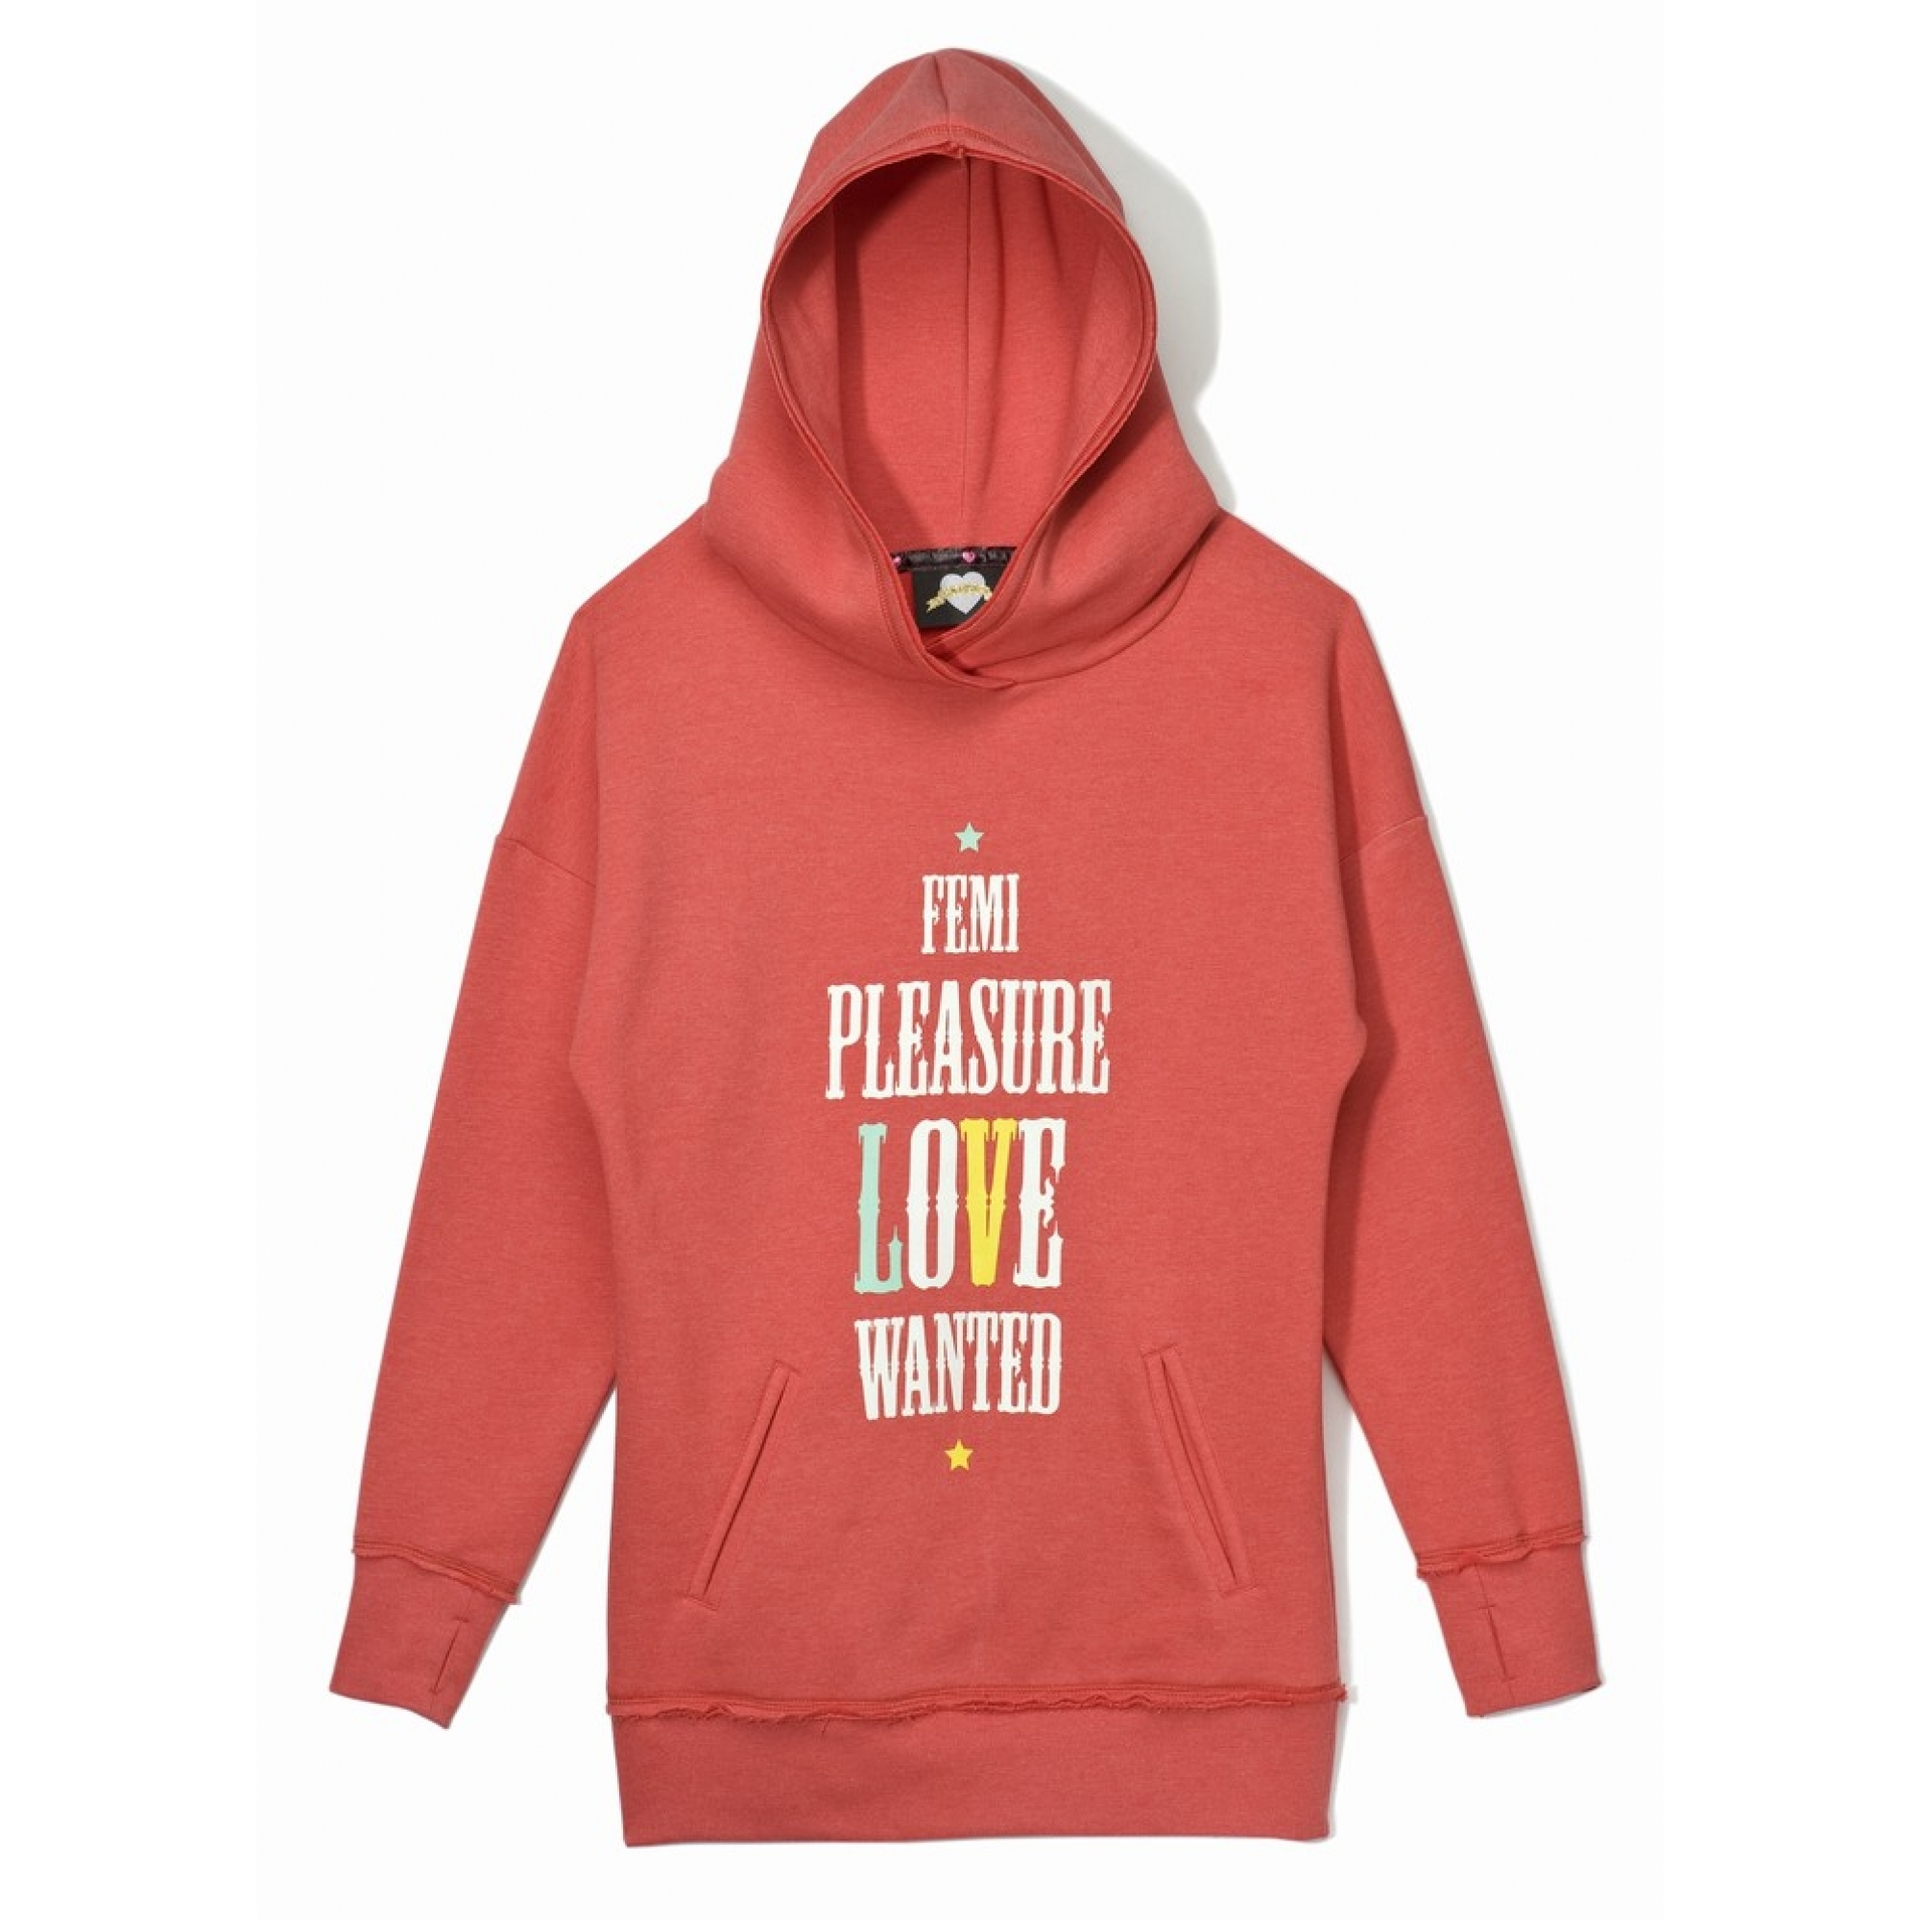 Bluza Femi Pleasure Wanted czerwona